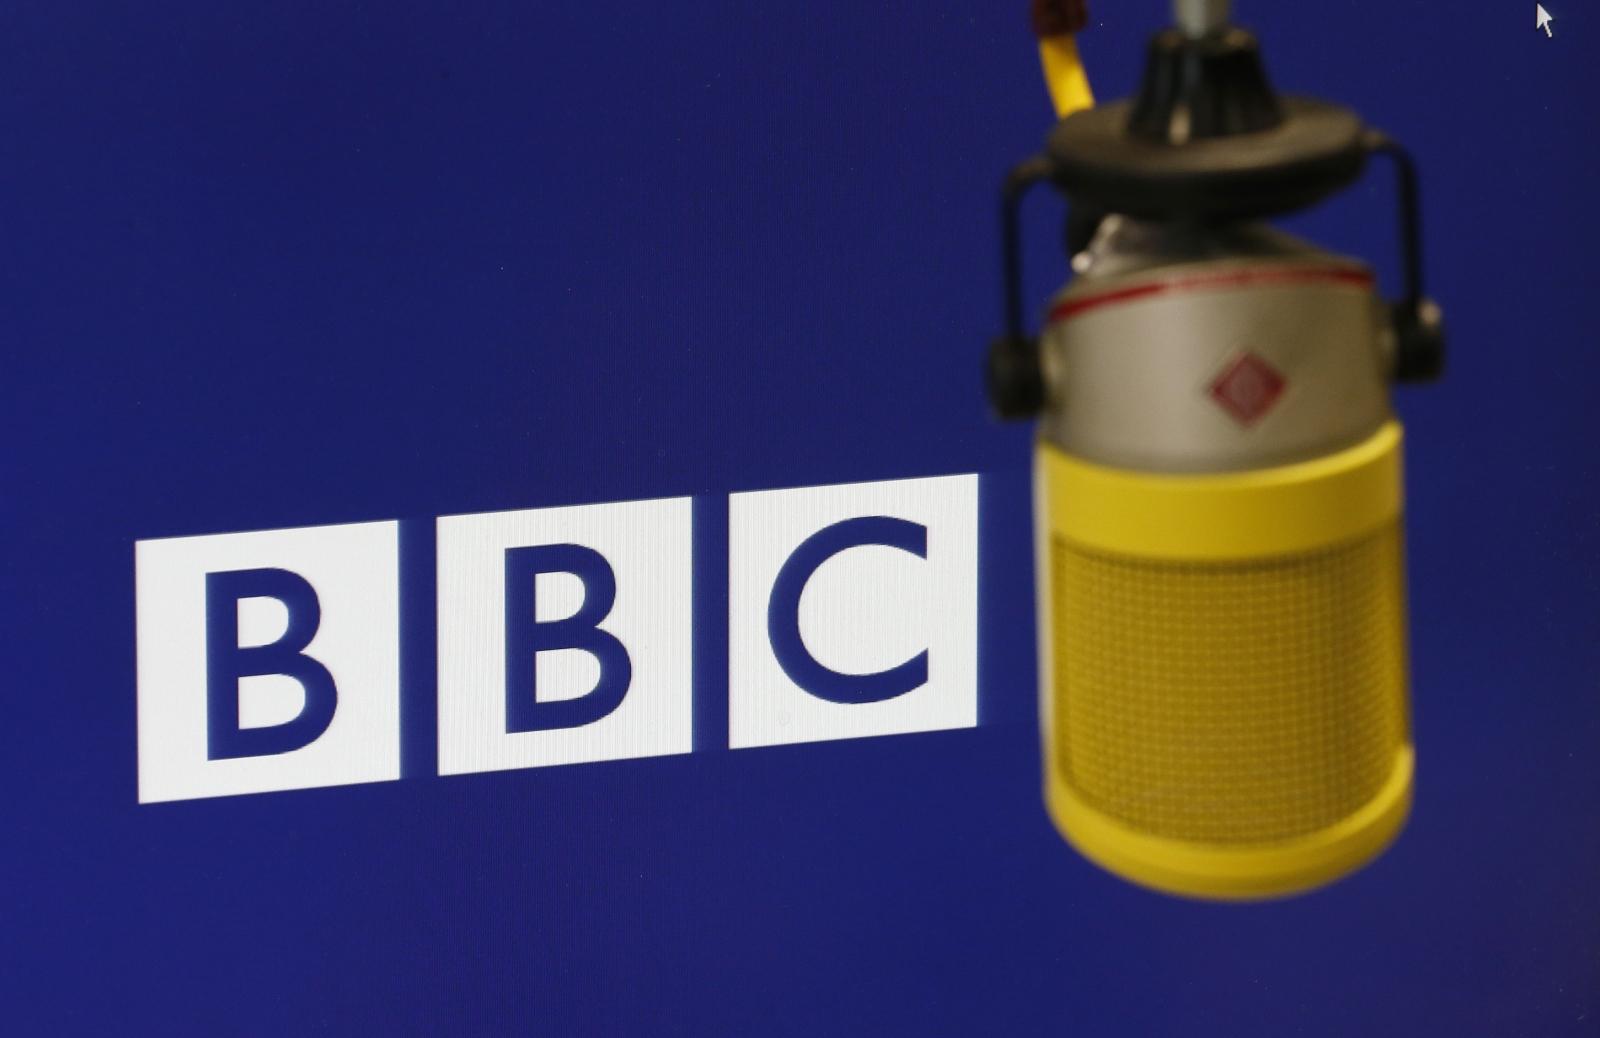 BBC World Service expansion North Korea